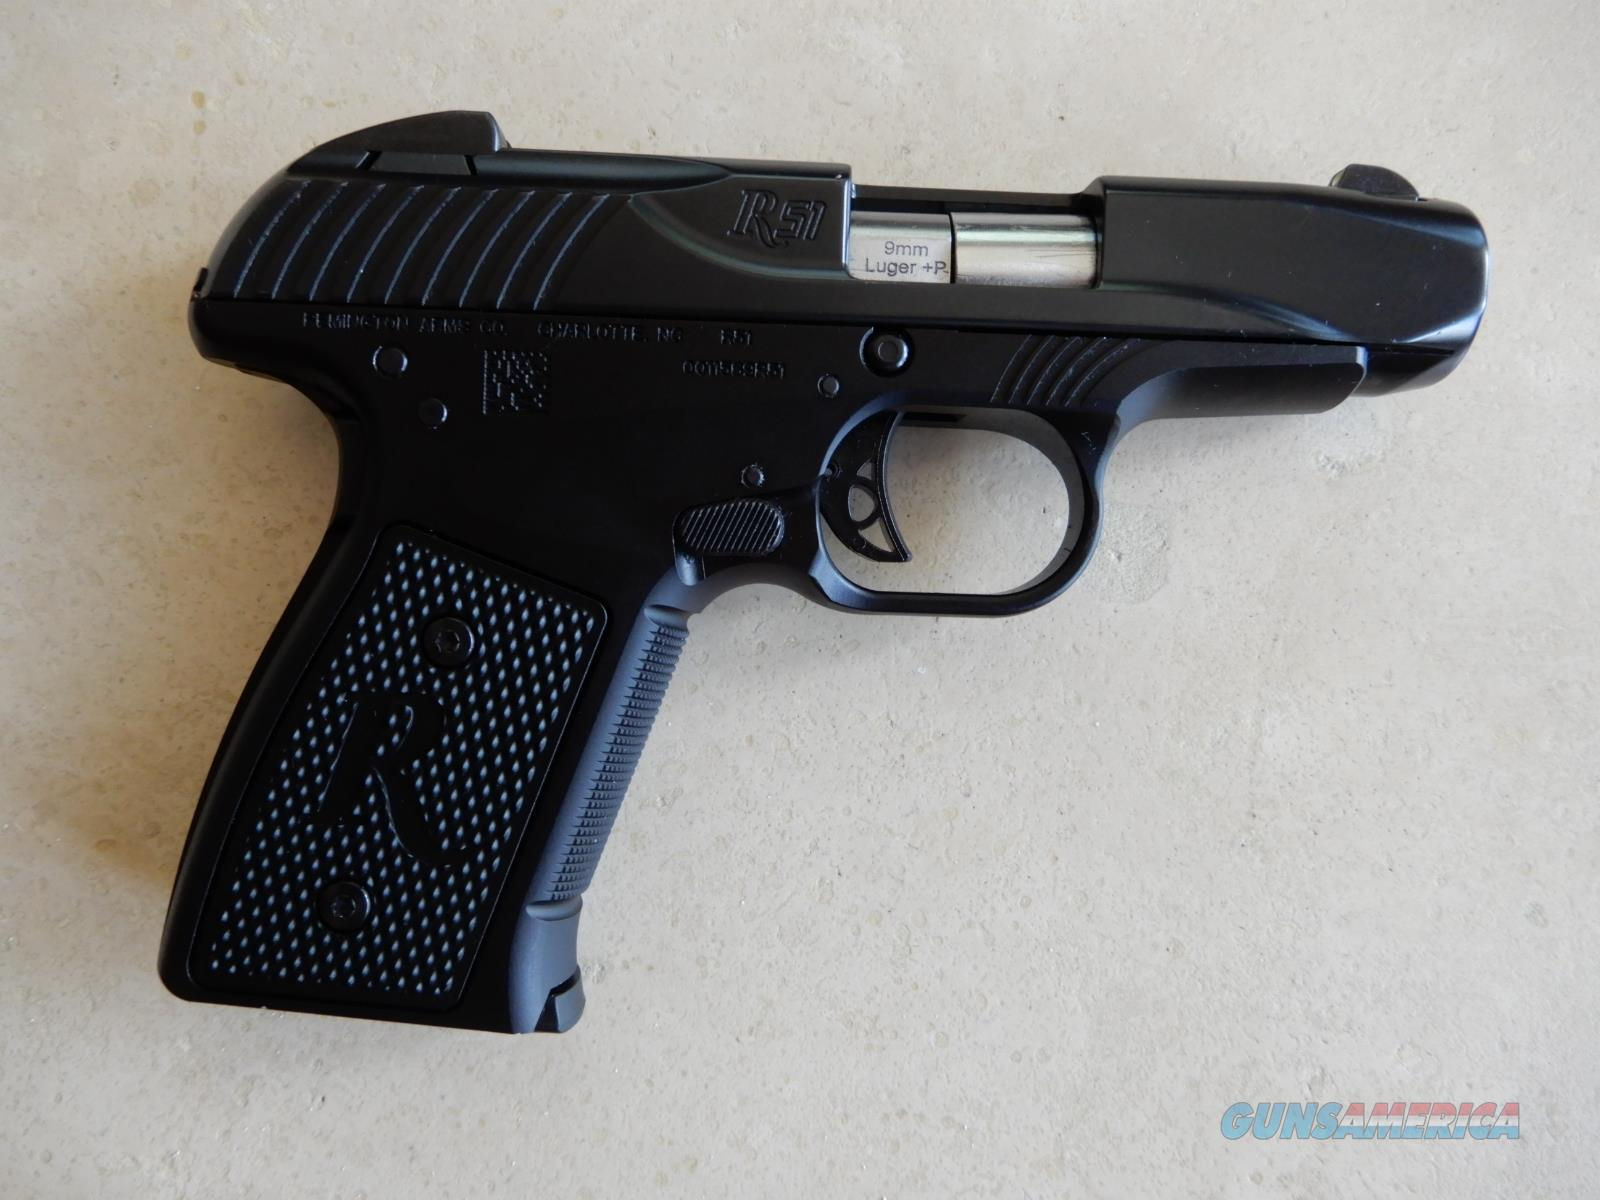 Second Gen R51  Guns > Pistols > Remington Pistols - Modern > R51